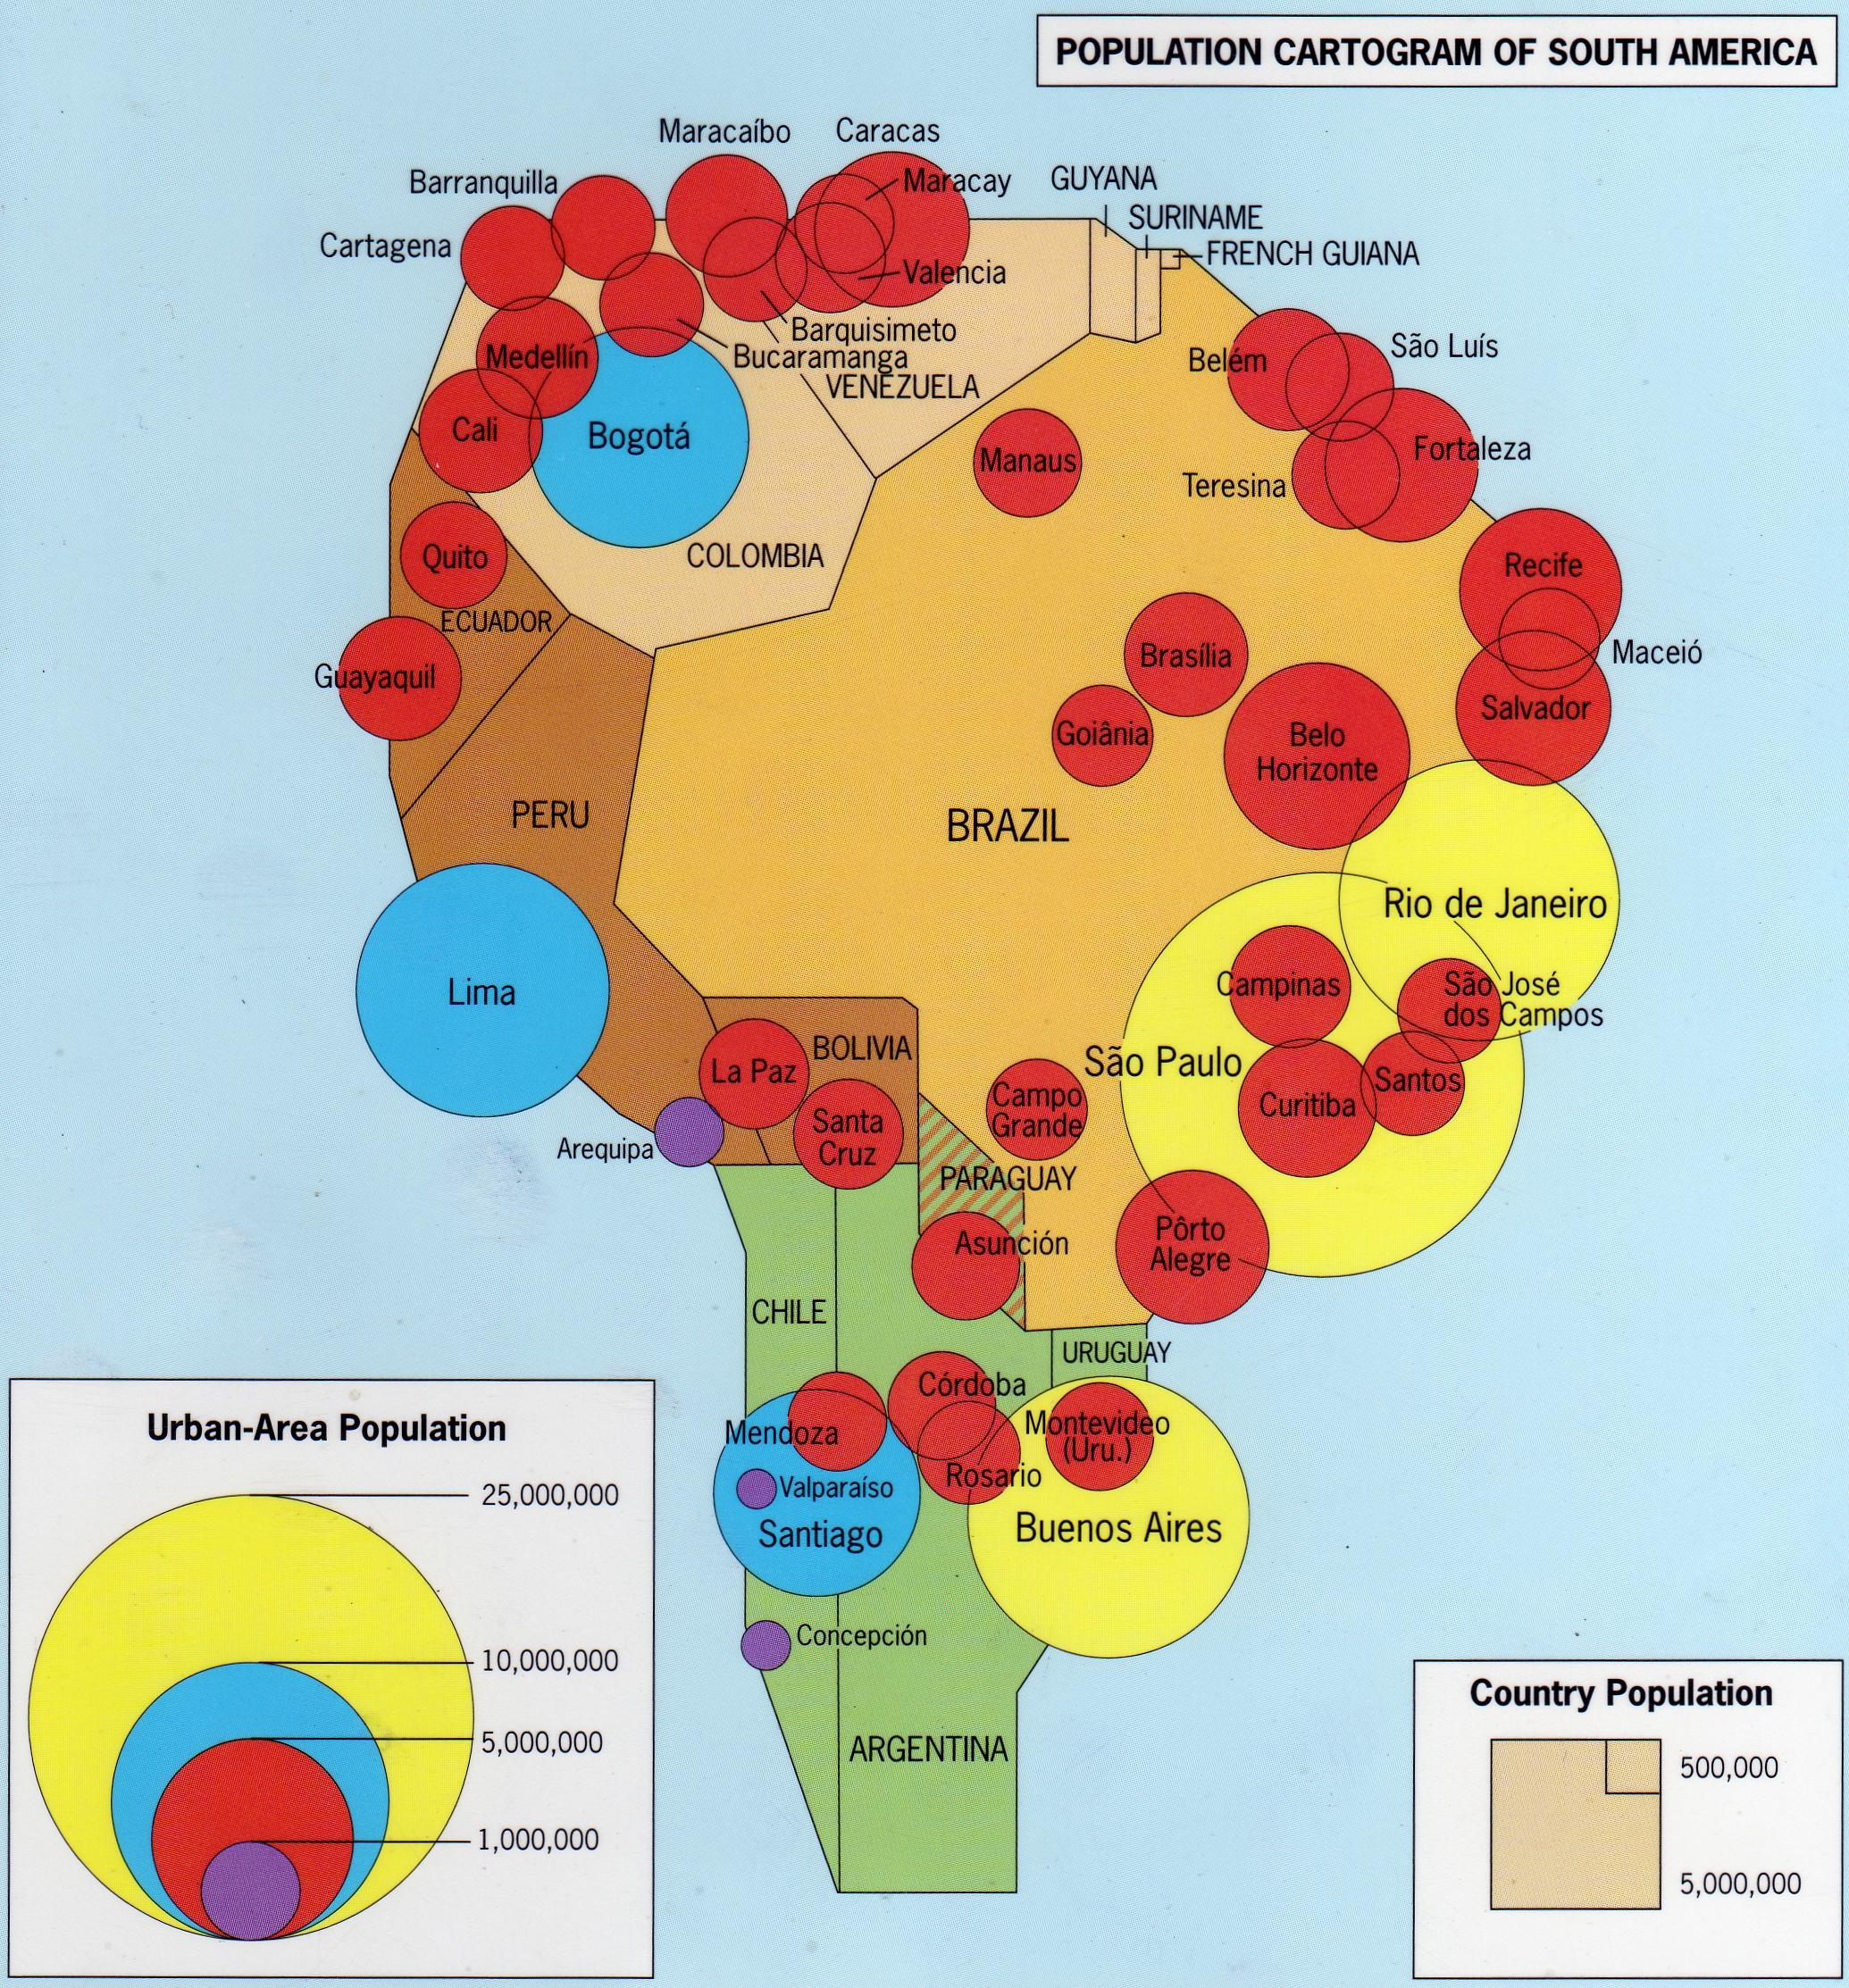 South American population